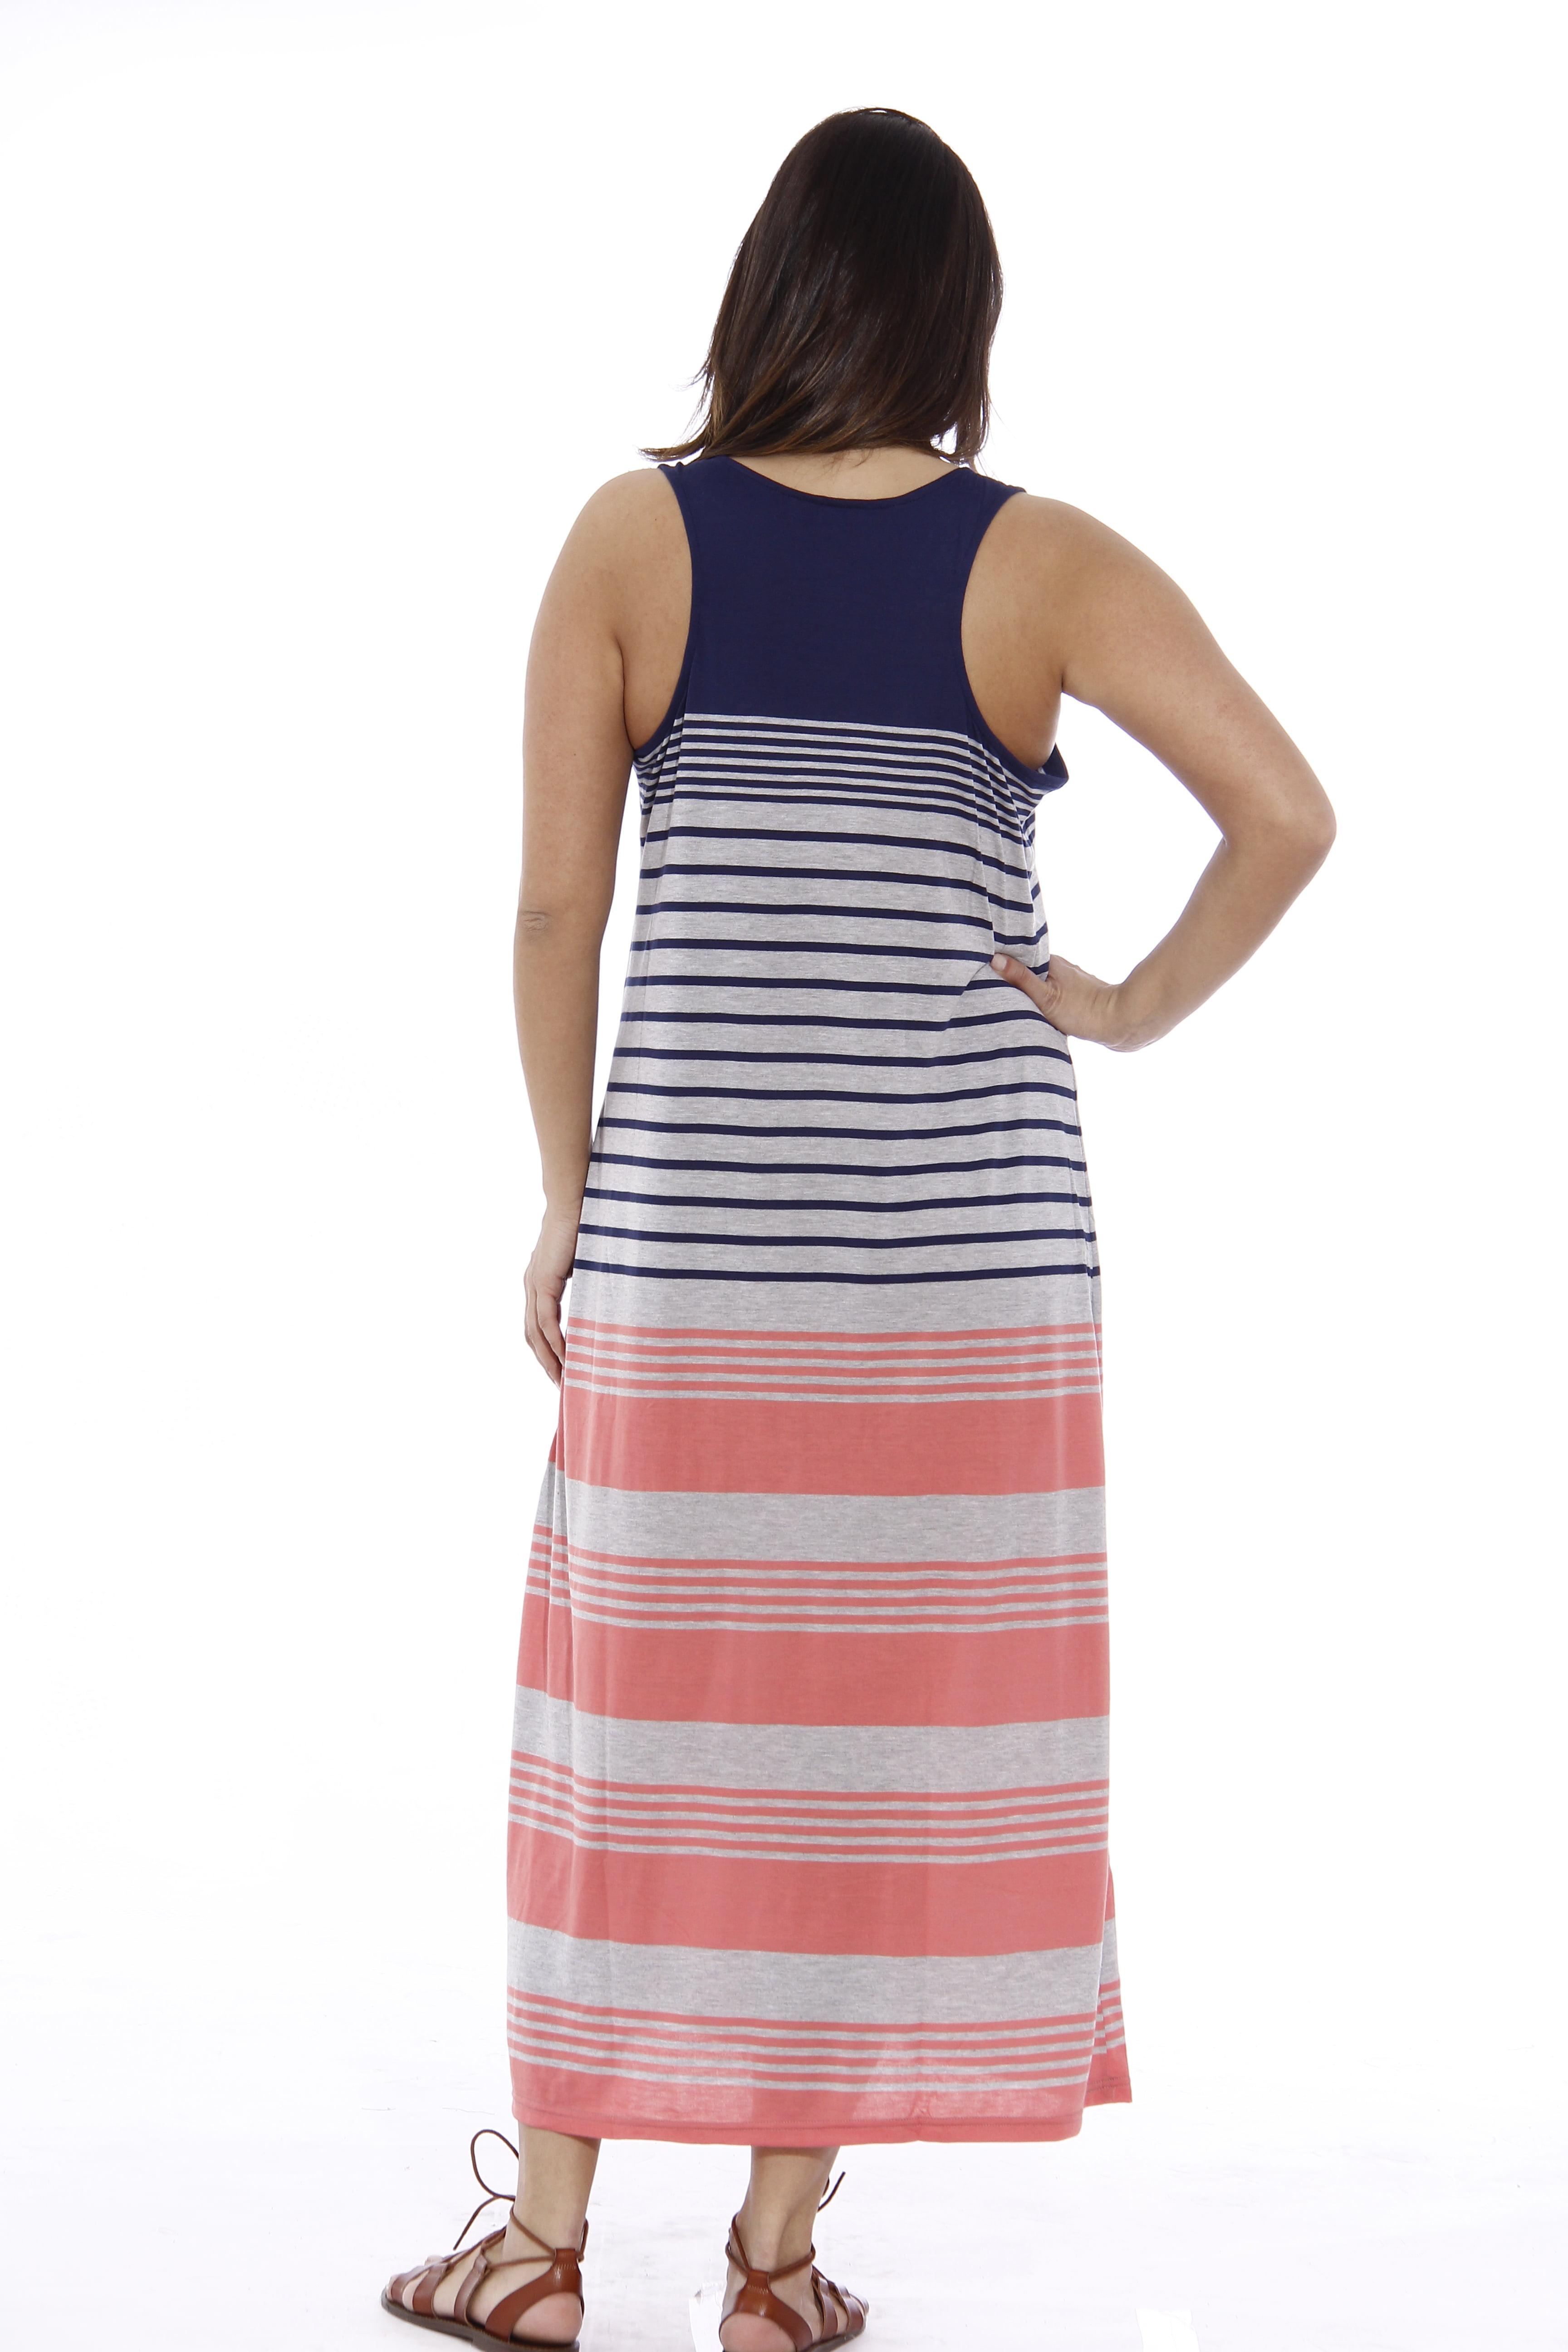 da1ef3518b23 Just Love - Plus Size Summer Dresses / Maxi Dress (Coral / Heather / Navy,  3X, Sundress) - Walmart.com